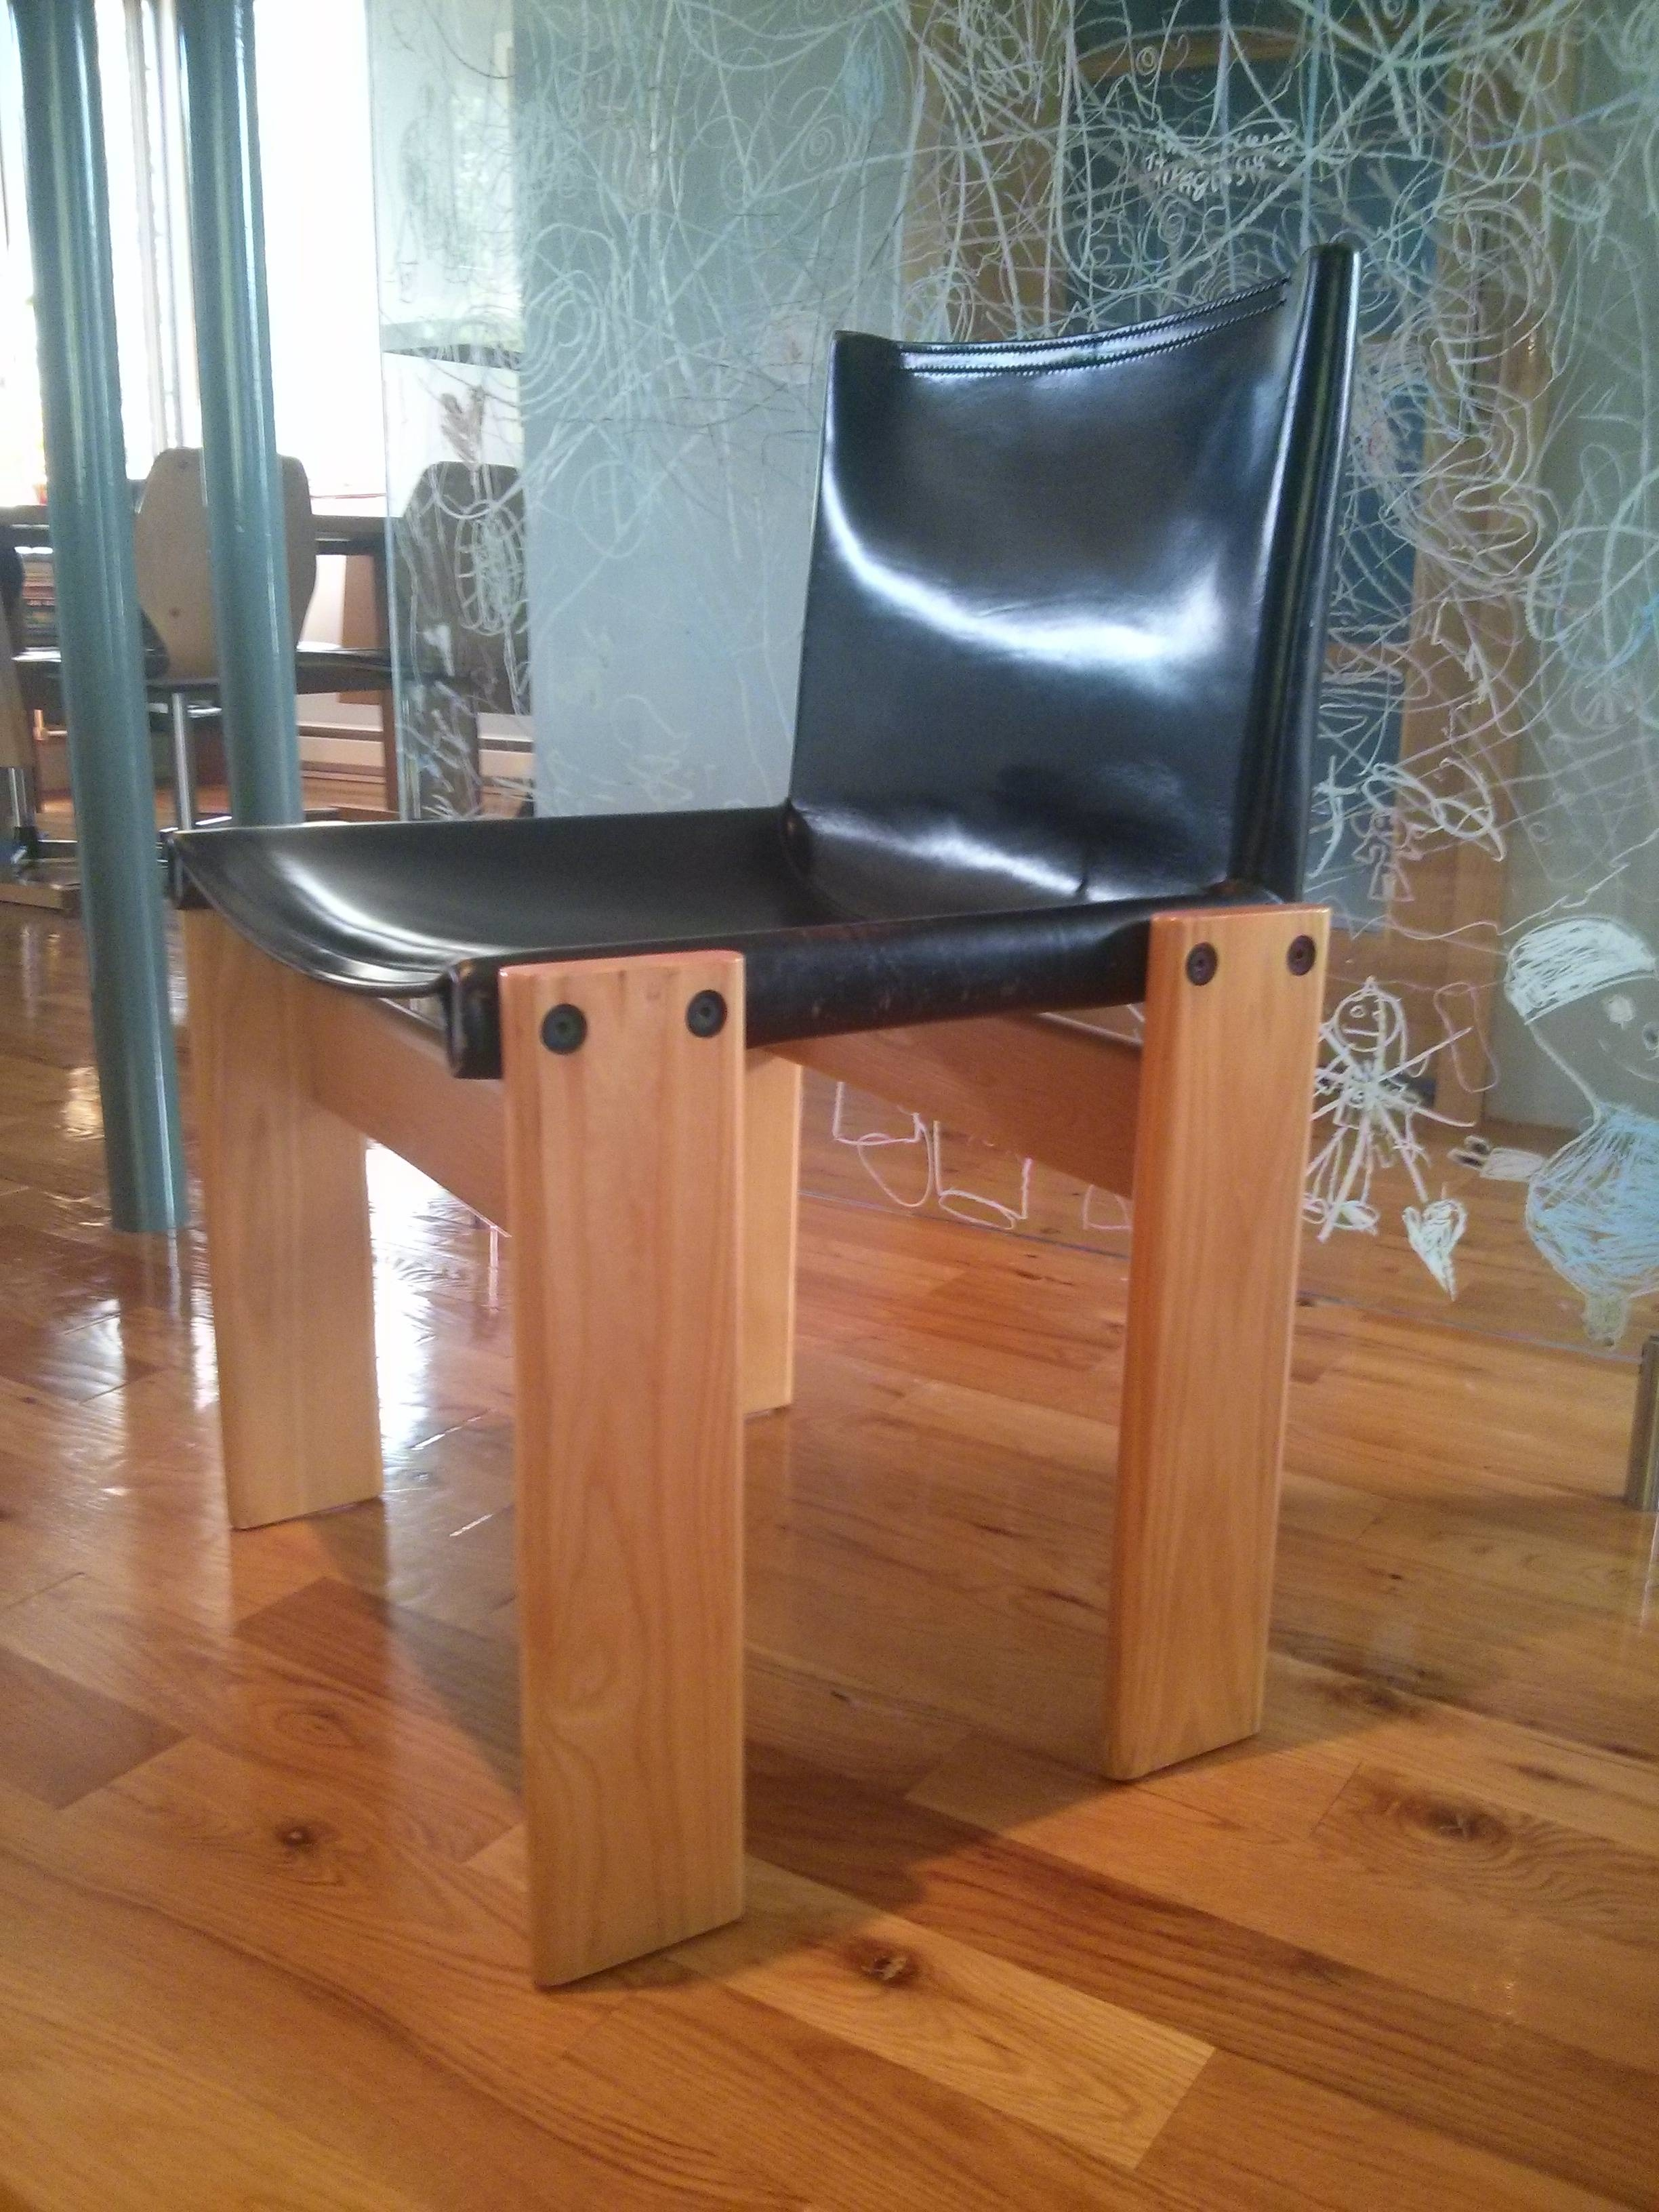 Designer Vintage And Mid Century Furniture Ottawa Regarding Monk Chairs (View 21 of 30)